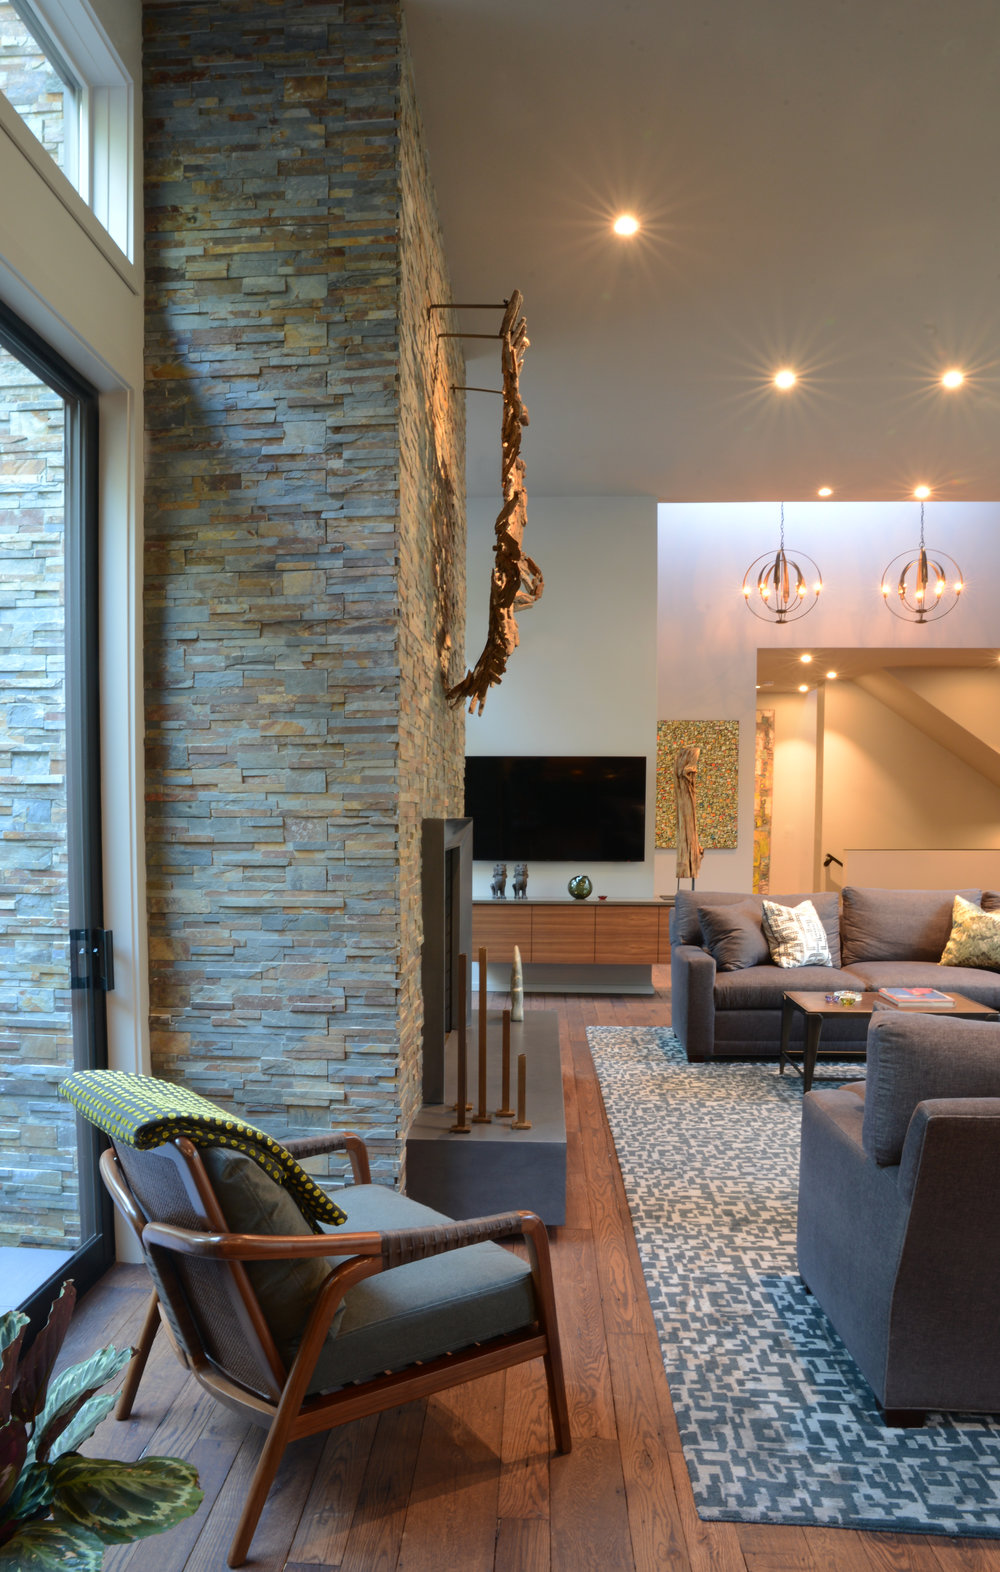 Warm Modern Interior Jeffrey Baker Architect And Interior Designer Atlanta  GA U2014 Jeffrey Bruce Baker Designs And JBB Architects And Interior Designers